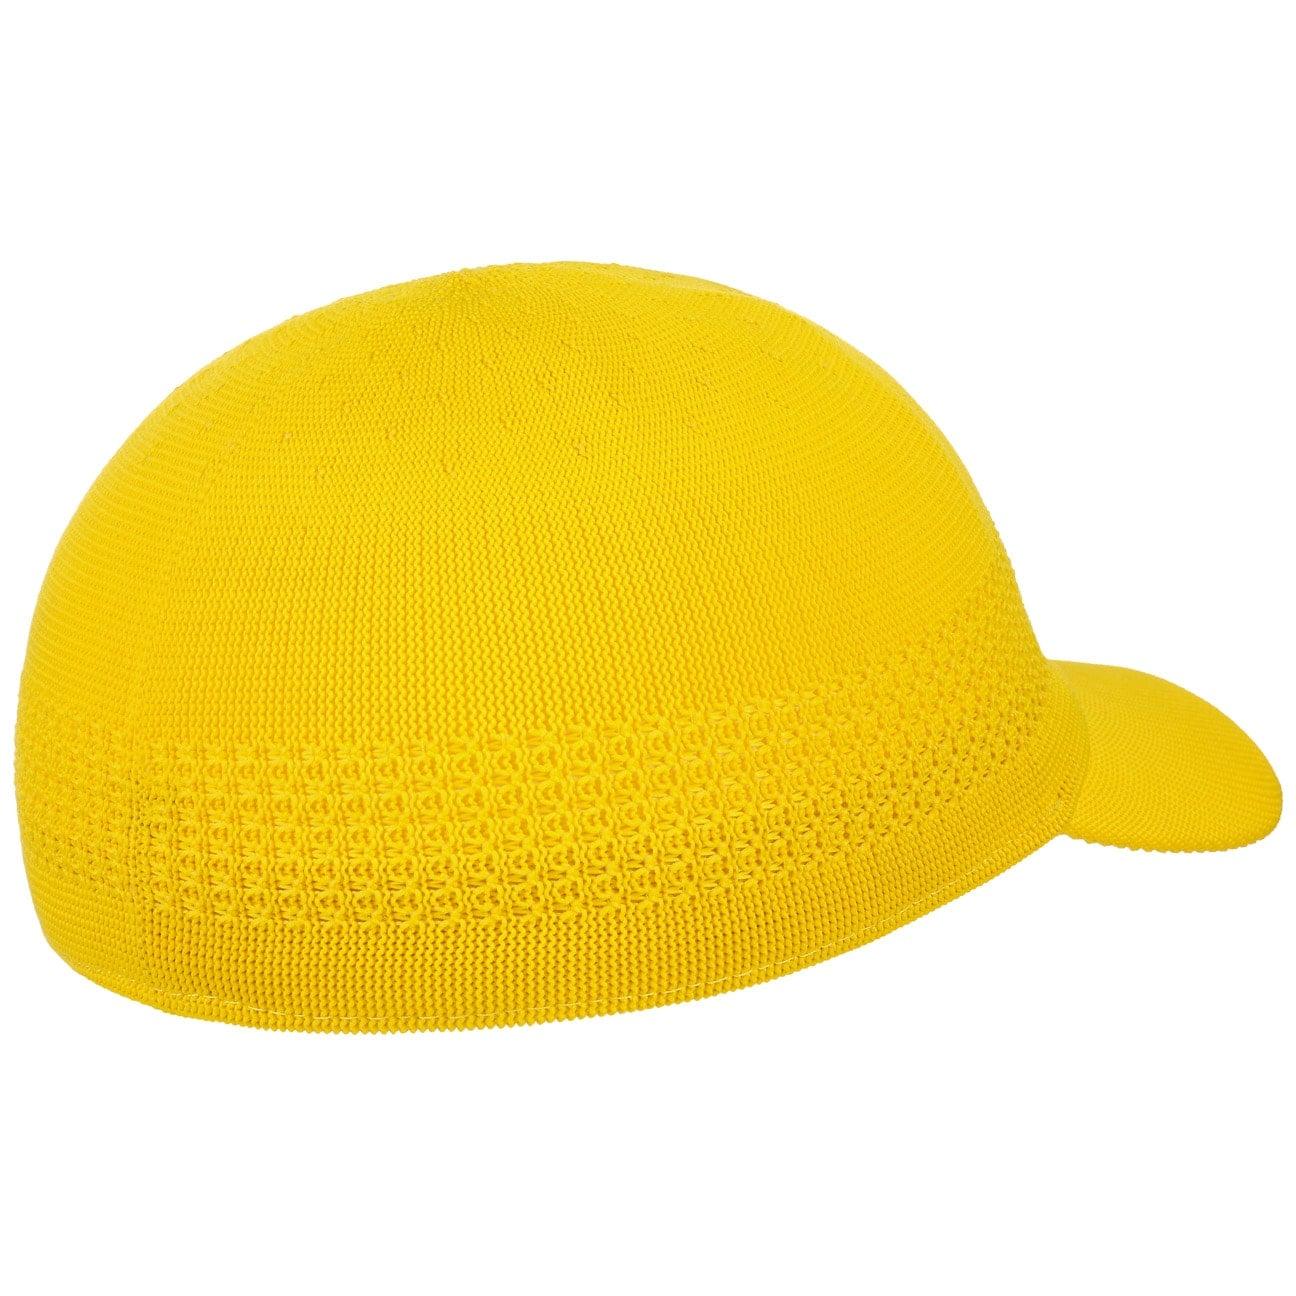 ... black 2 · Ventair Space Cap by Kangol - yellow 4 ... 87bb15ba26e0